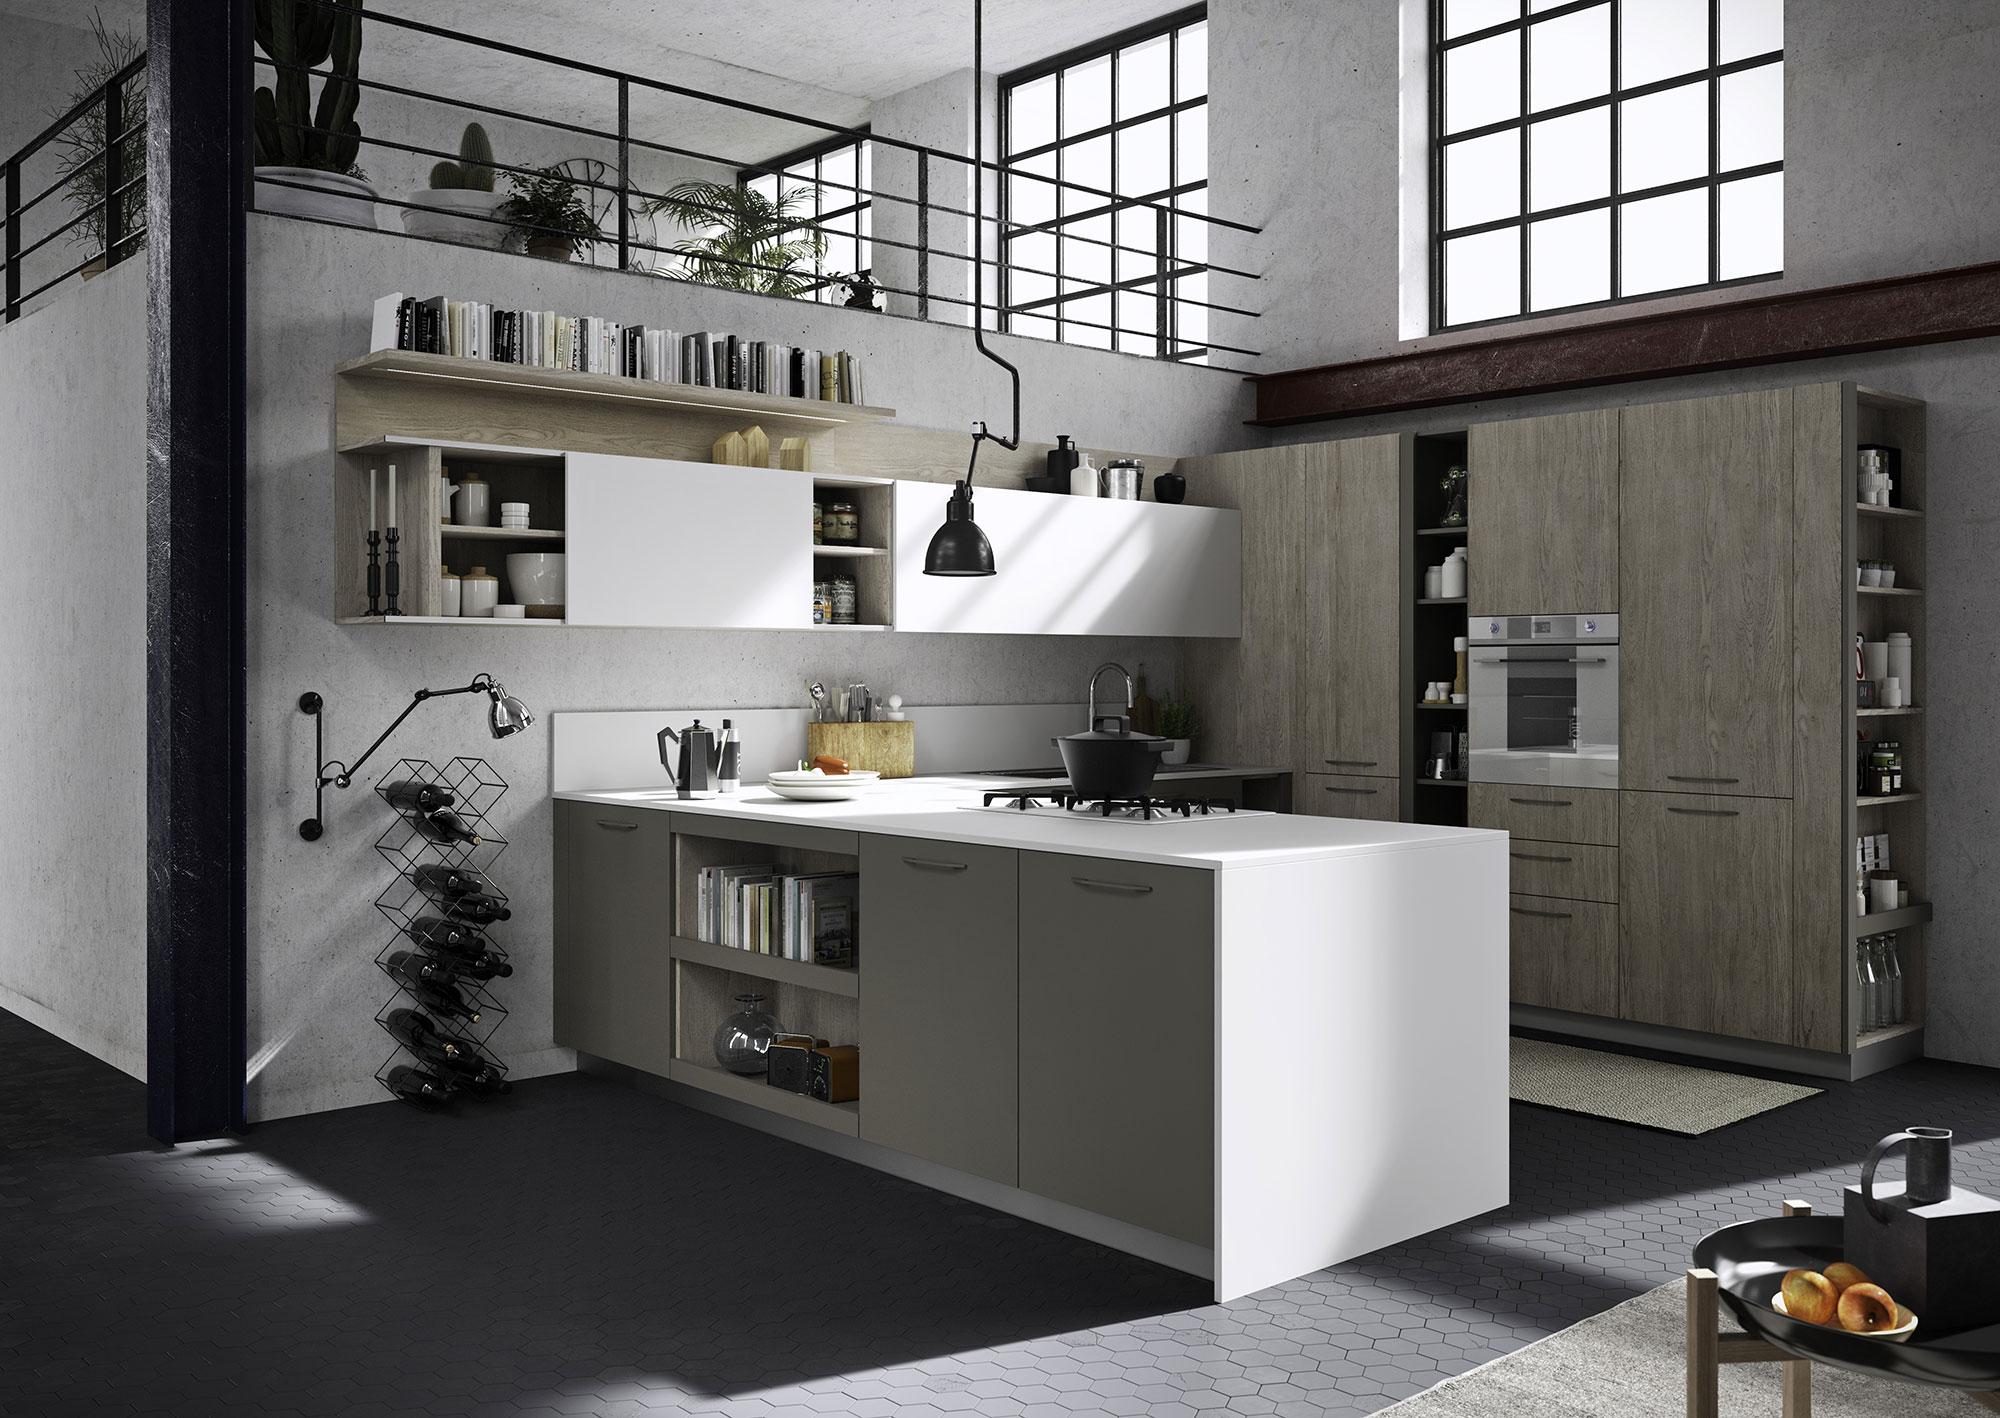 cucina-dettaglio-Fun-bianco-gesso-1